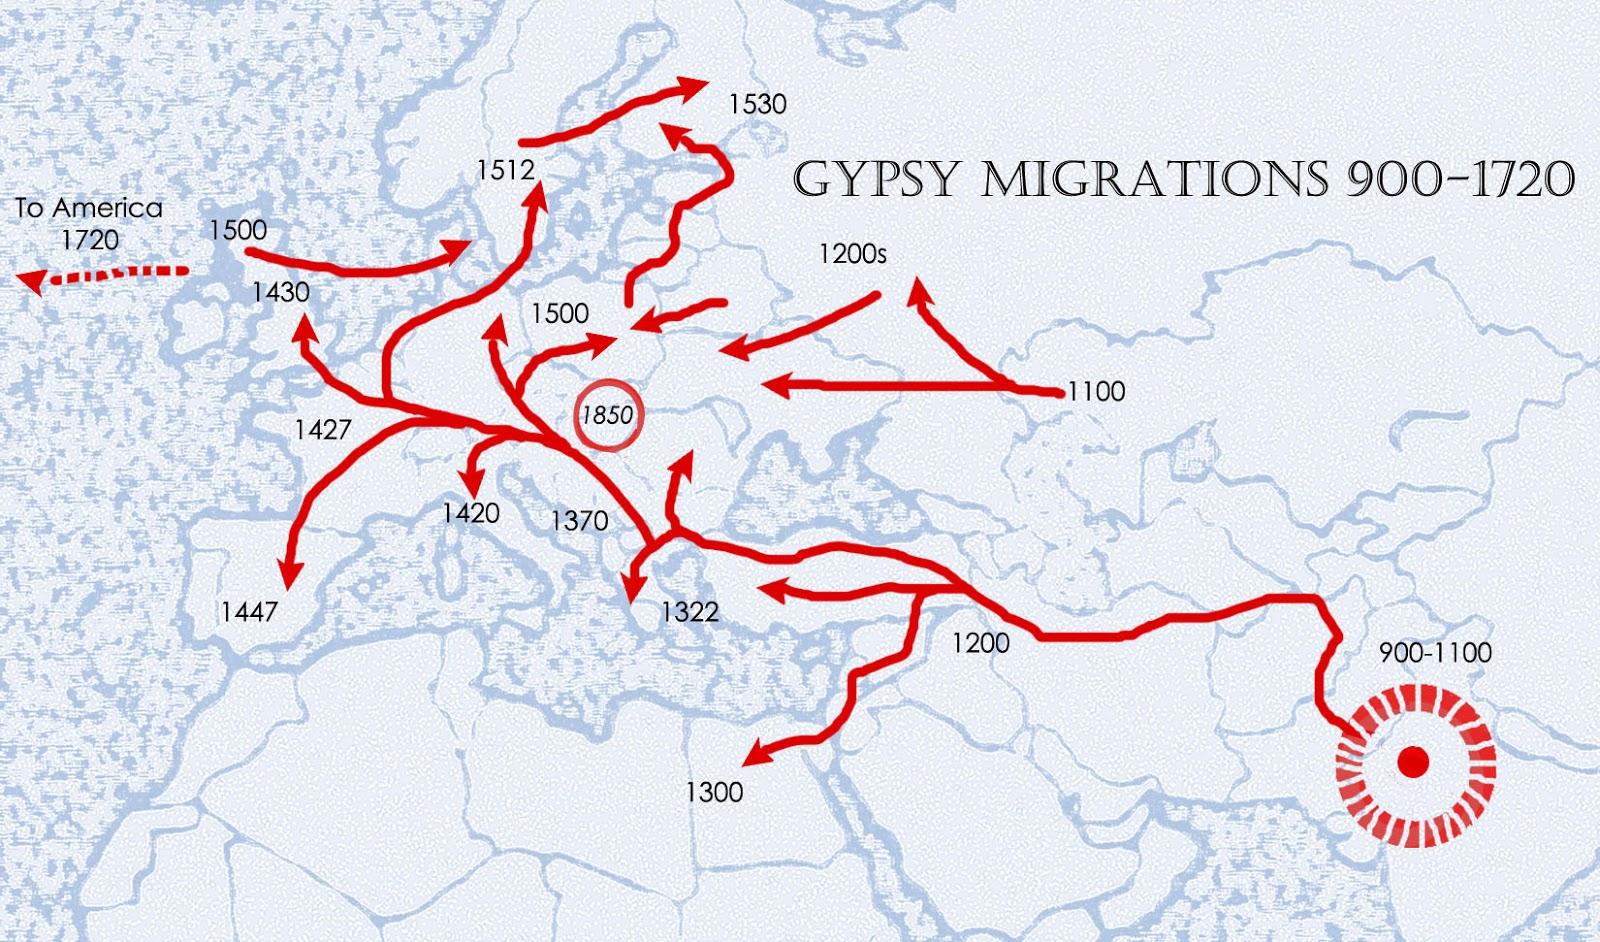 Gypsy migrations (900 - 1720)